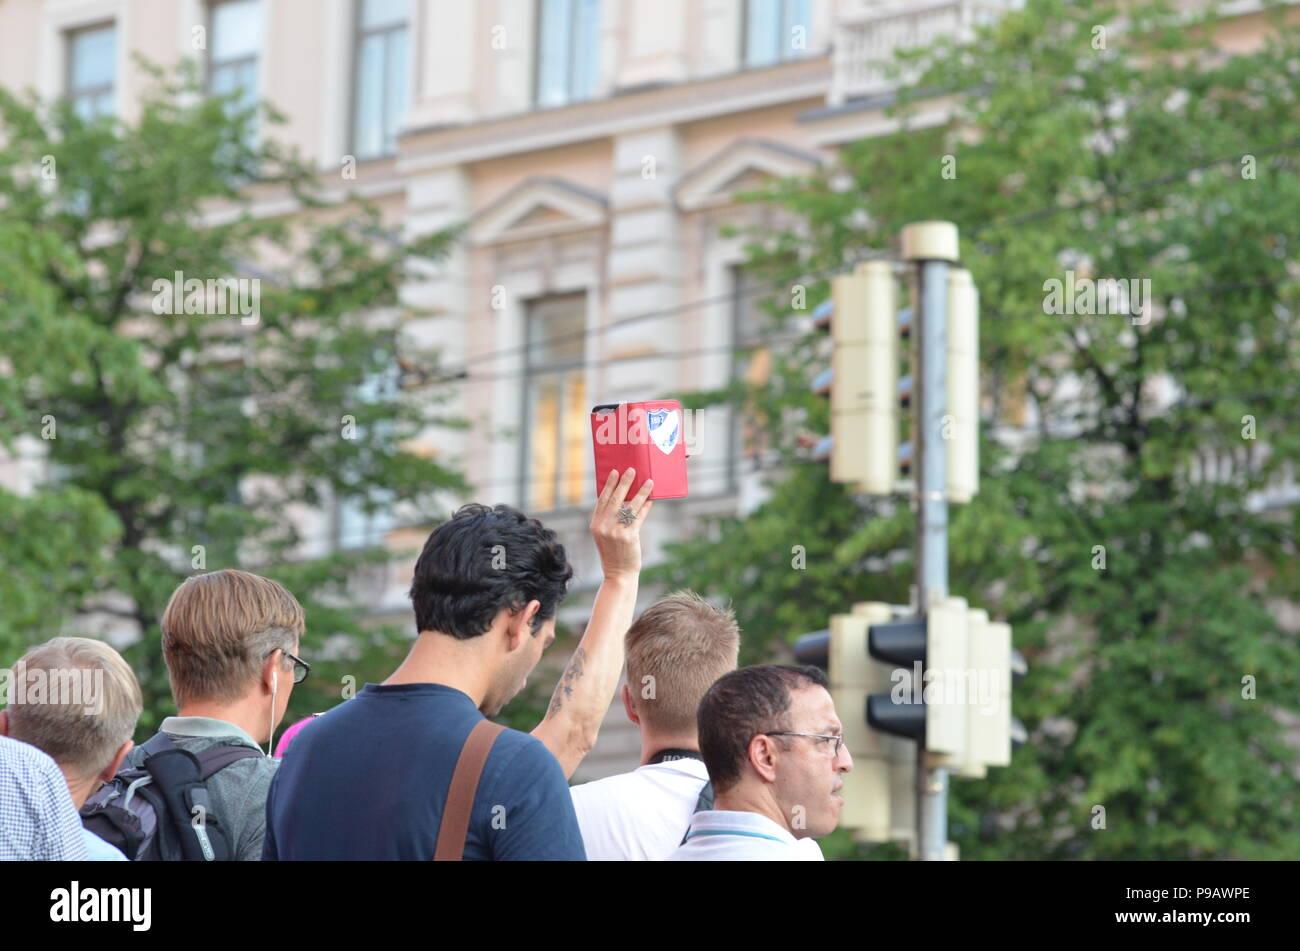 Vladimirputin High Resolution Stock Photography And Images Alamy